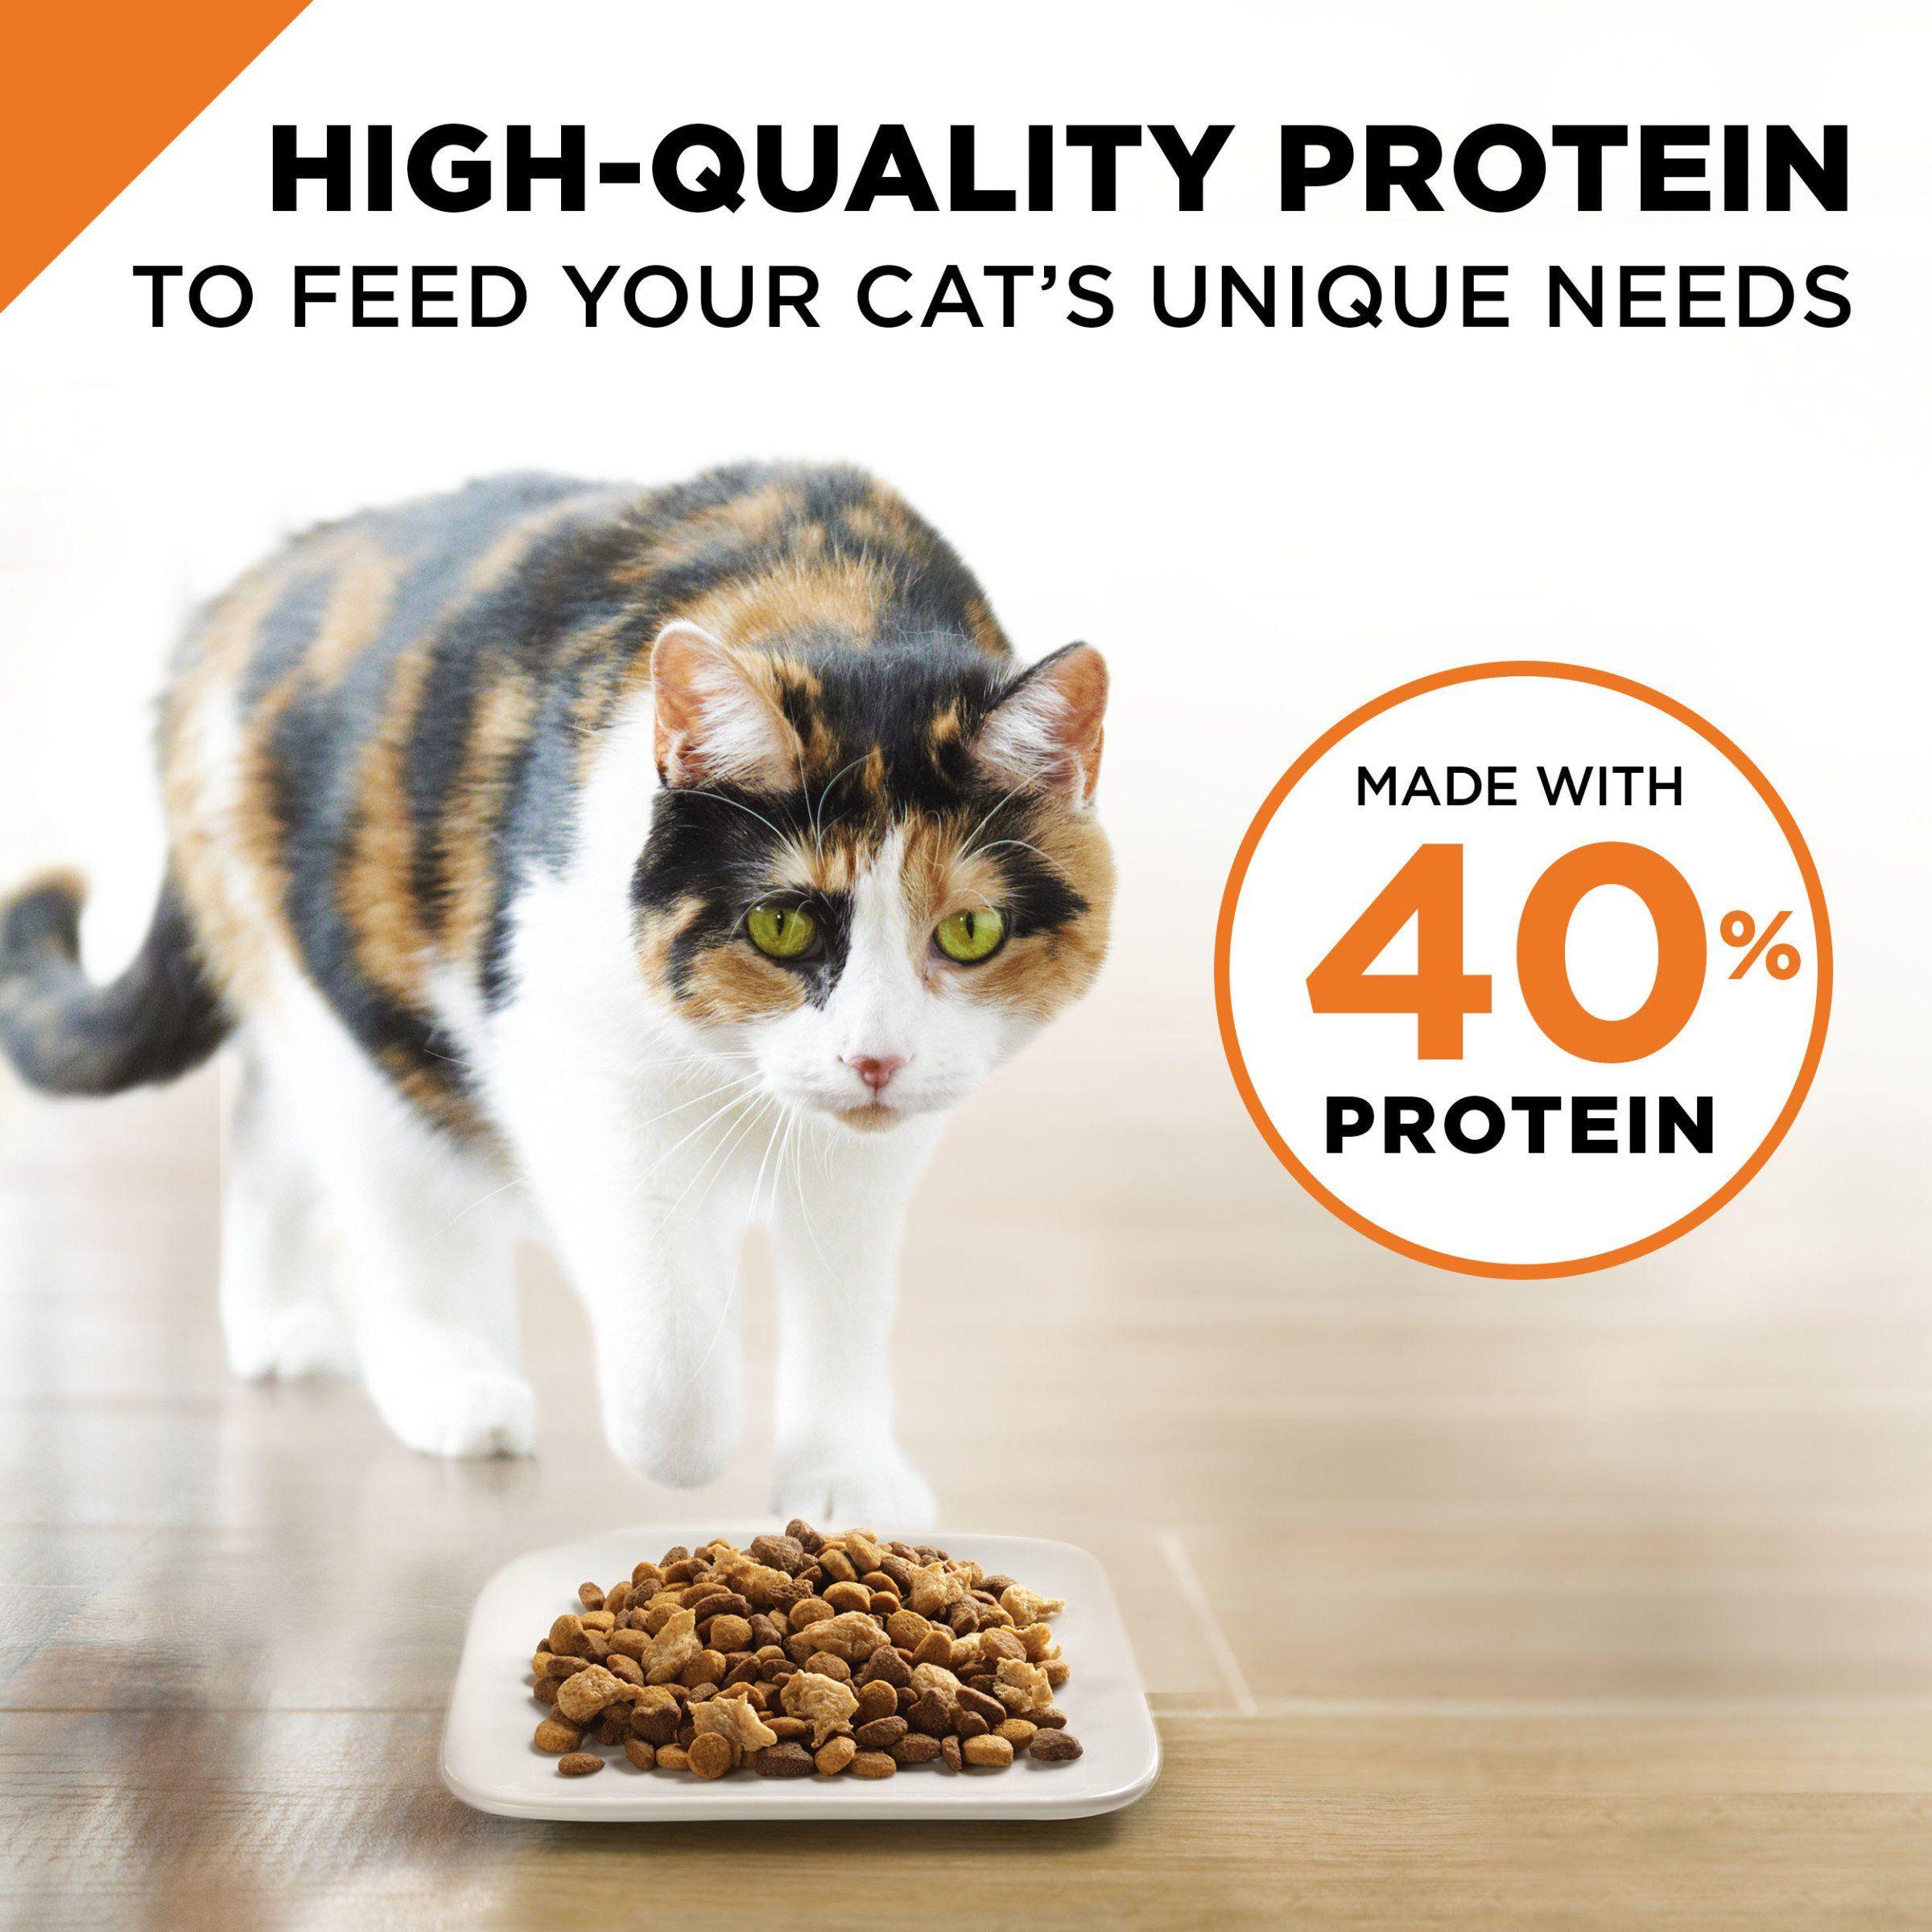 Purina Pro Plan Savor Adult Shredded Blend Chicken And Rice Formula Adult Dry Cat Food 1 6 Lb Bag Visit The Image Li Dry Cat Food Purina Pro Plan Cat Food